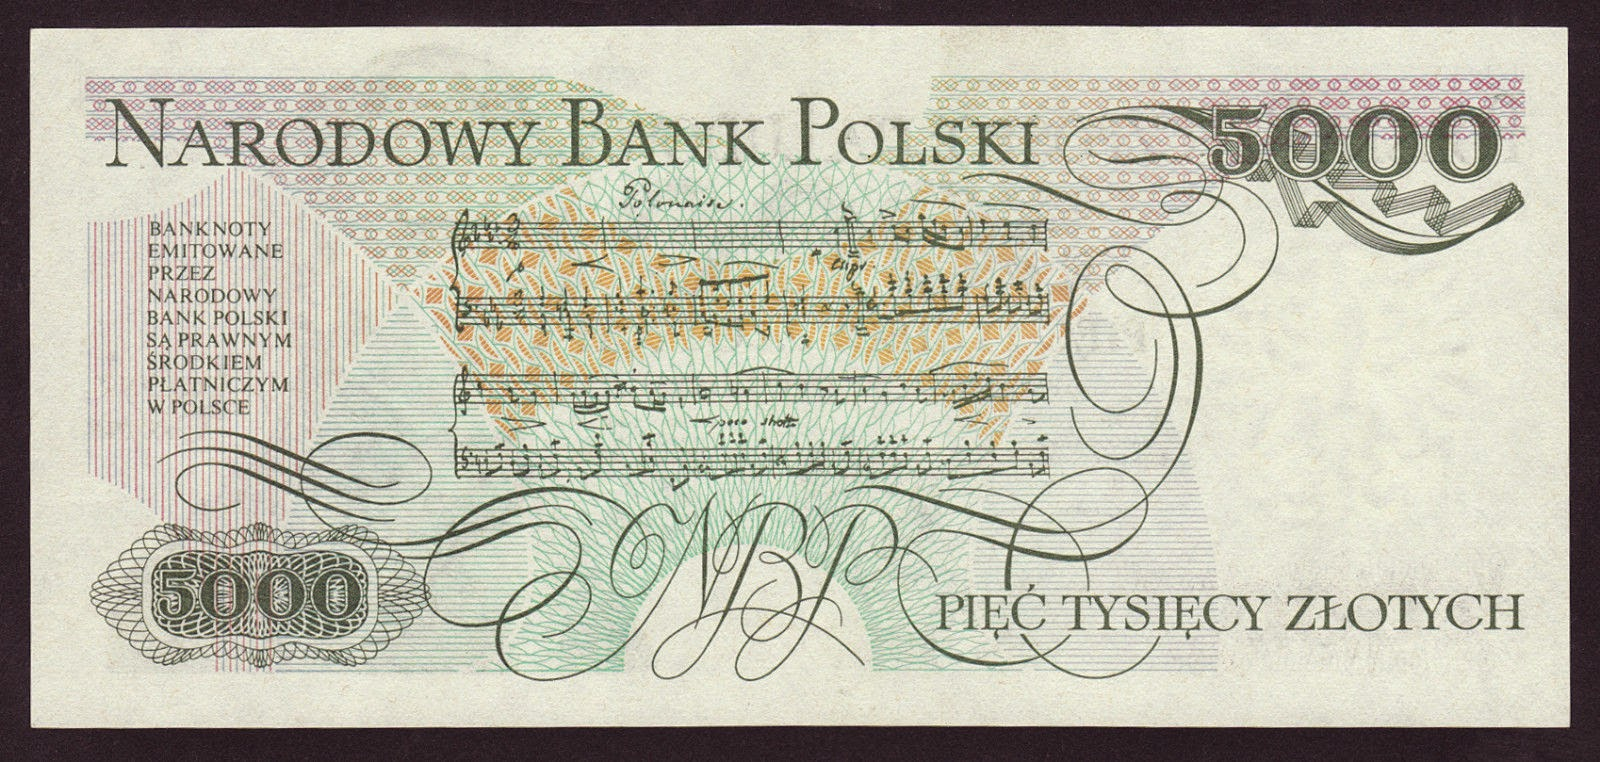 Poland Banknotes 5000 Zloty banknote 1982 Chopin's Polonaise